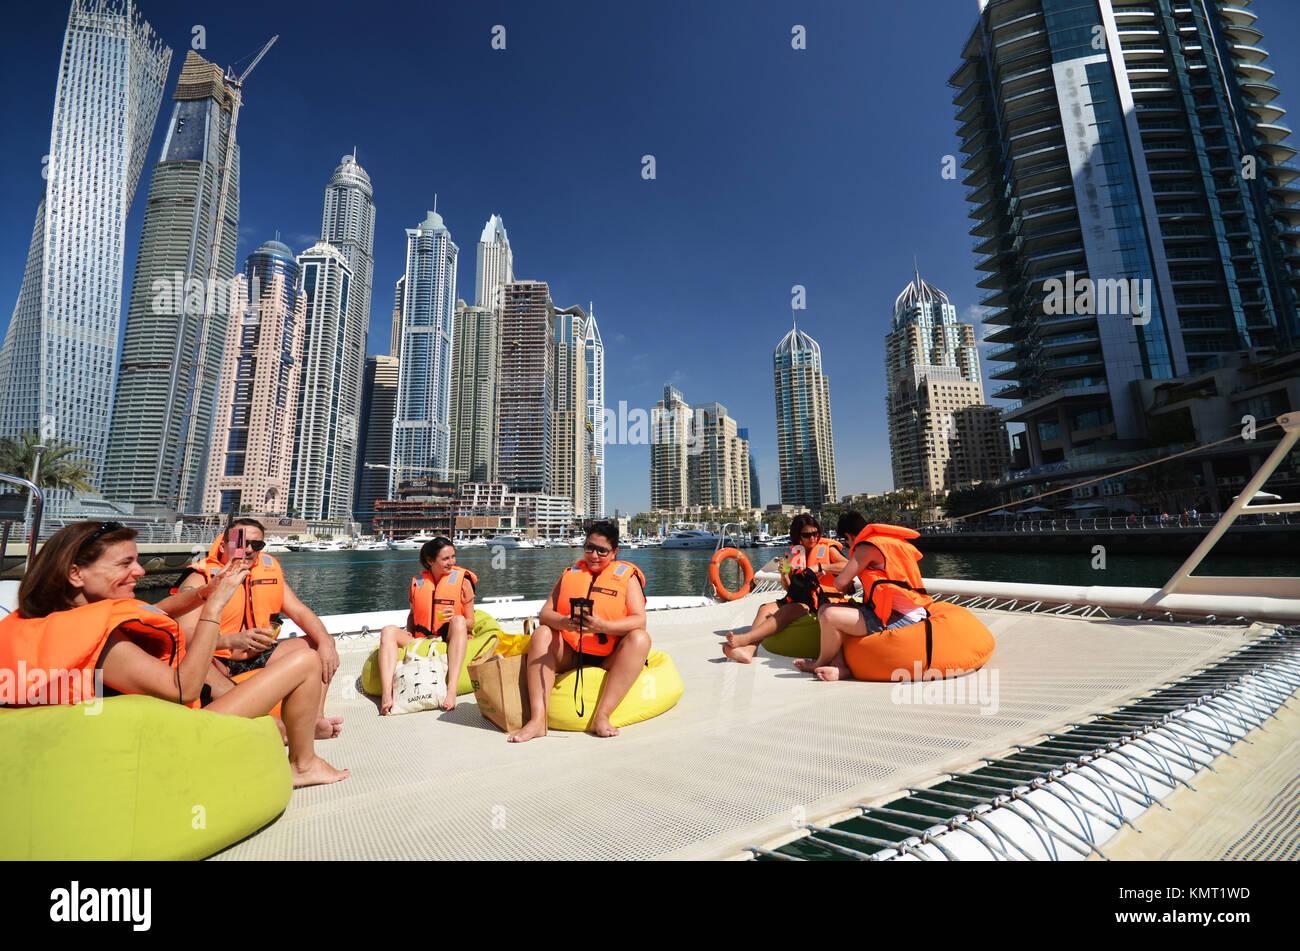 People on catamaran boat in Dubai looking towards city sky line and sky scrapers - Stock Image